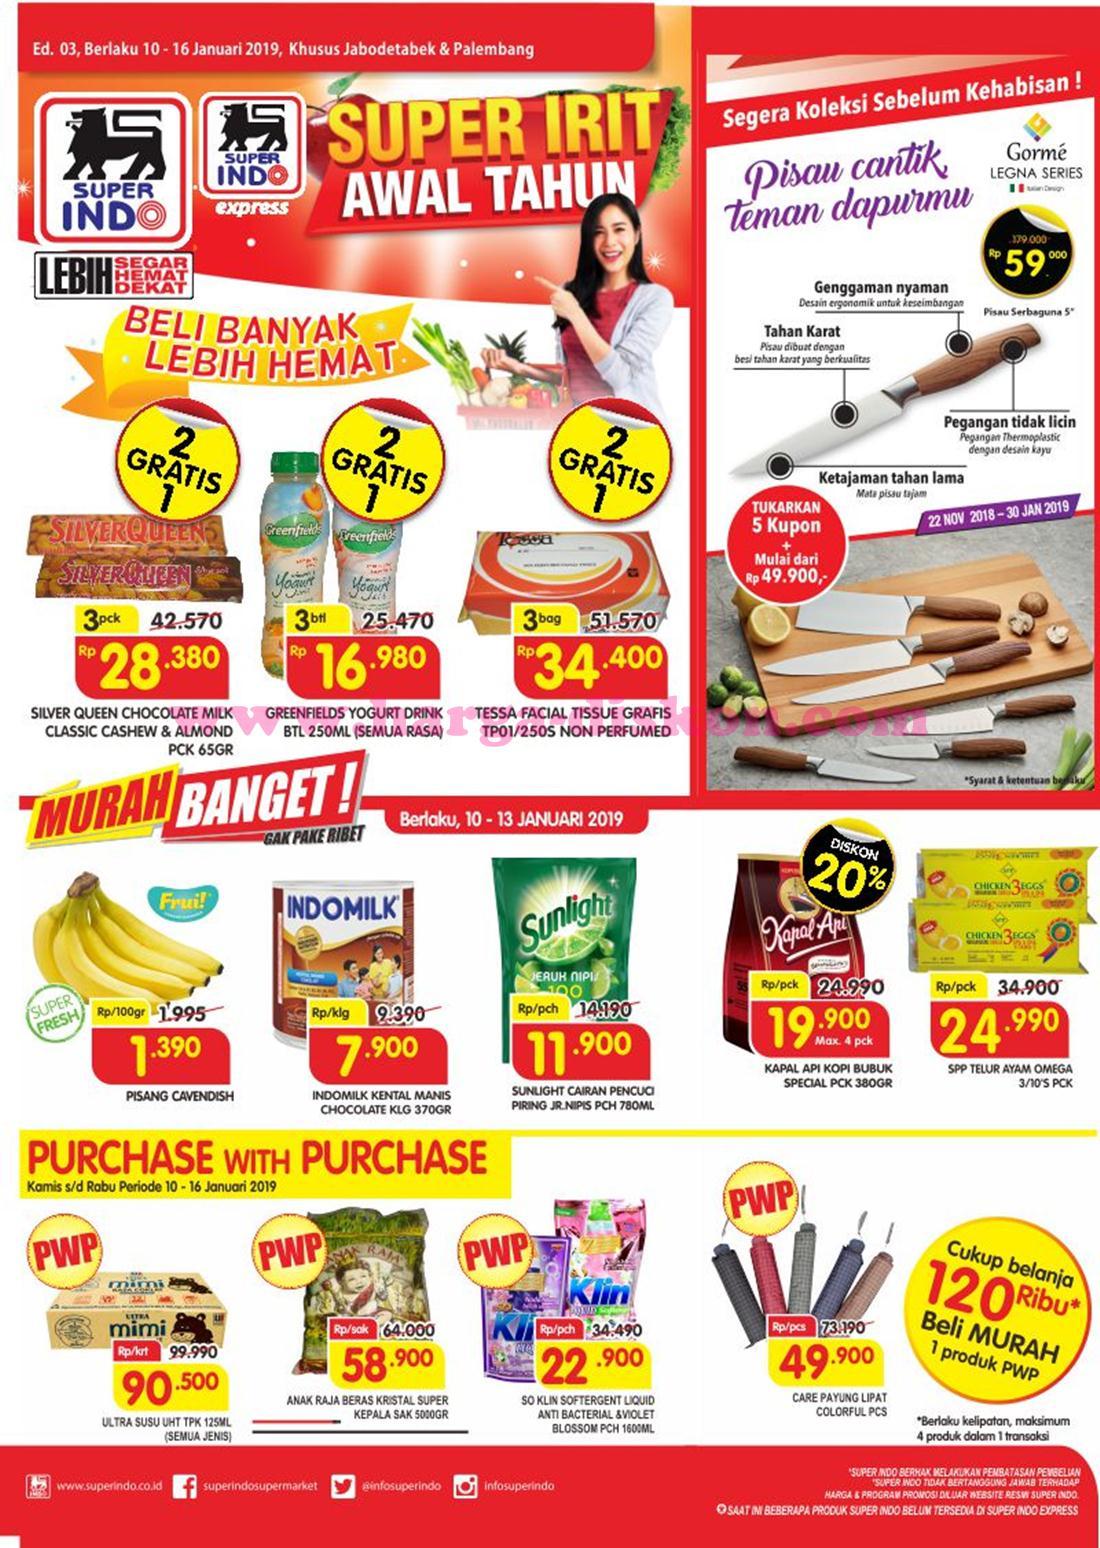 Katalog Promo Superindo 10 16 Januari 2019 Harga Promo